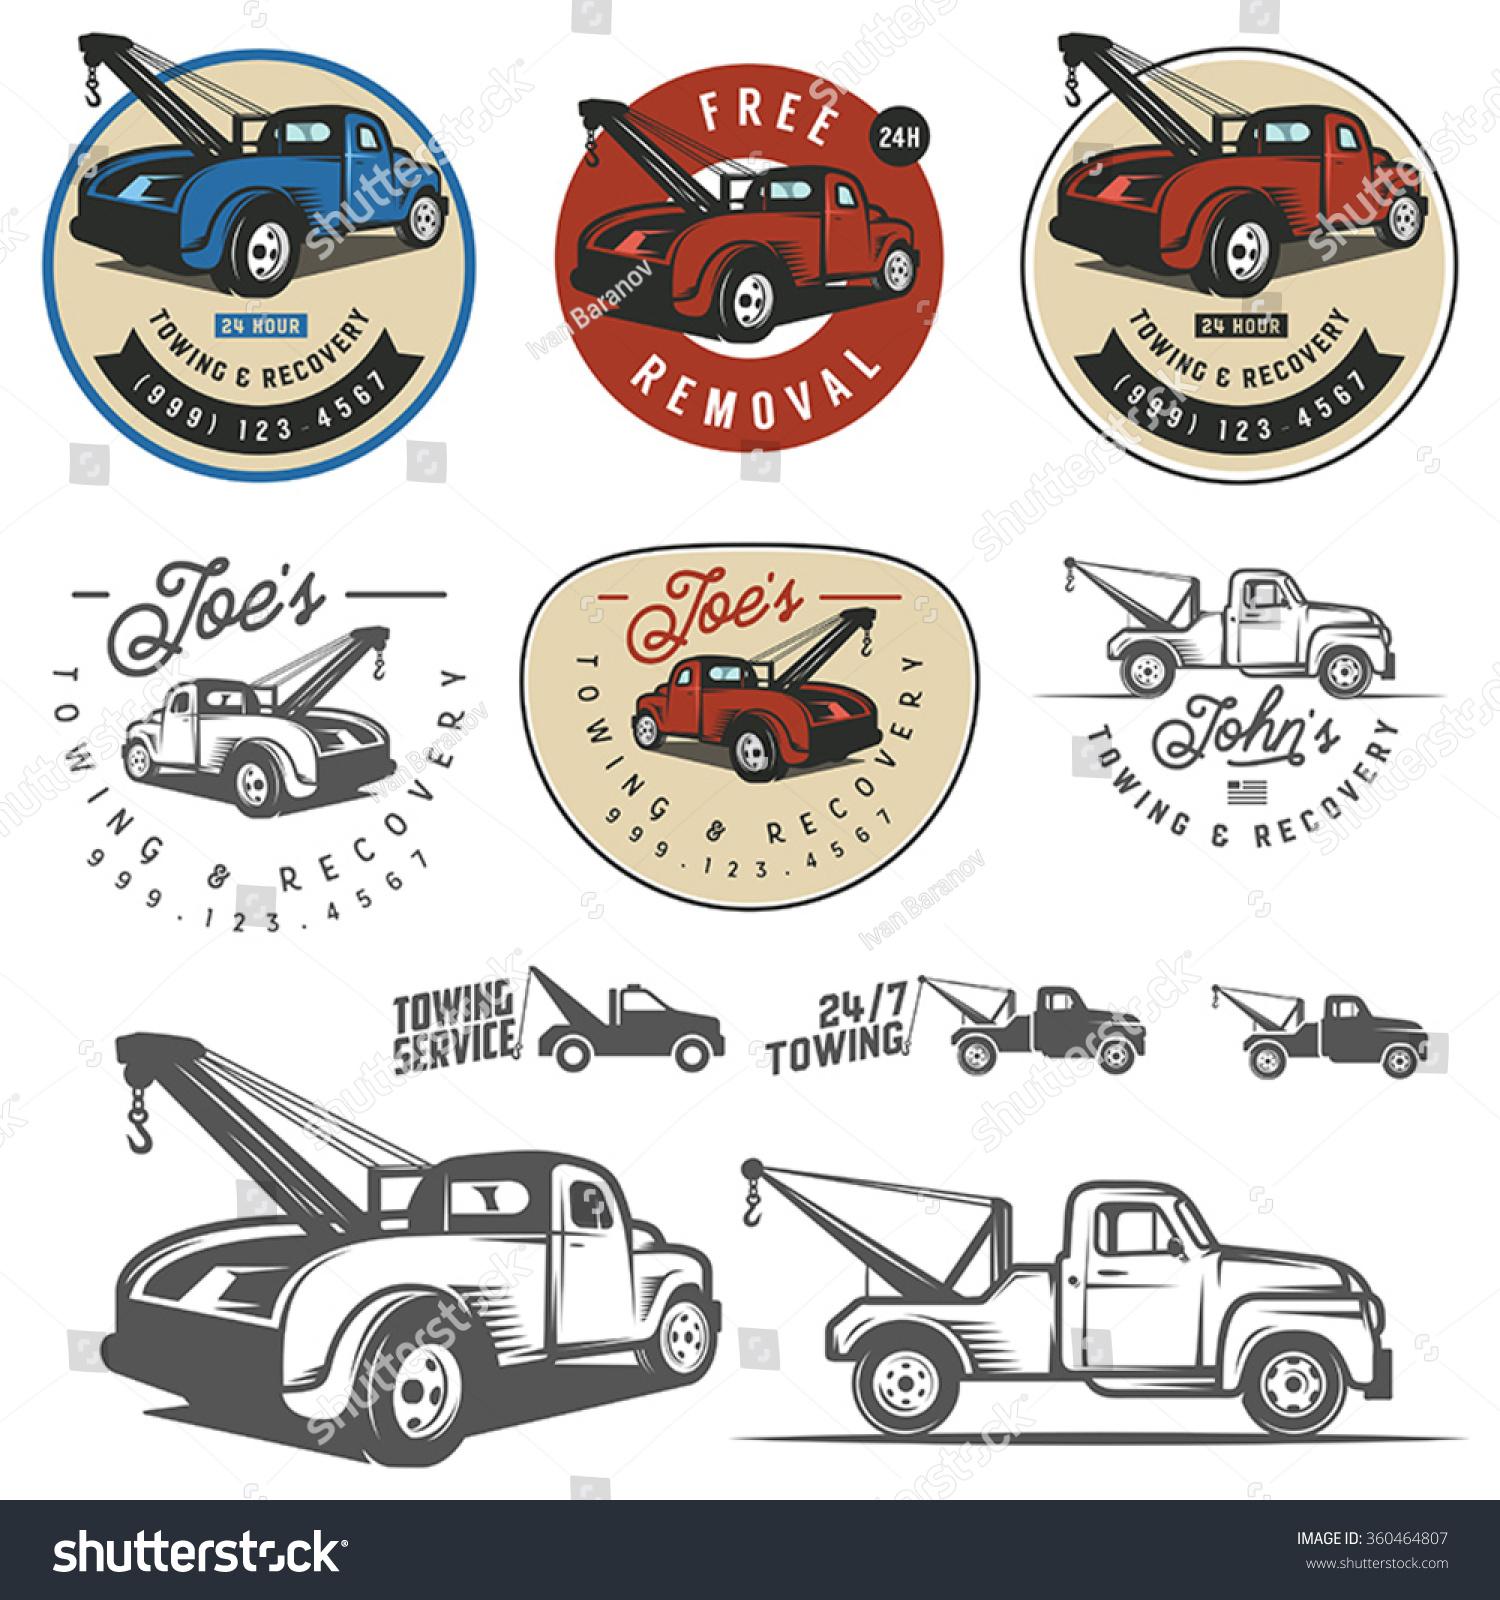 Design car emblem - Vintage Car Tow Truck Emblems Labels And Design Elements